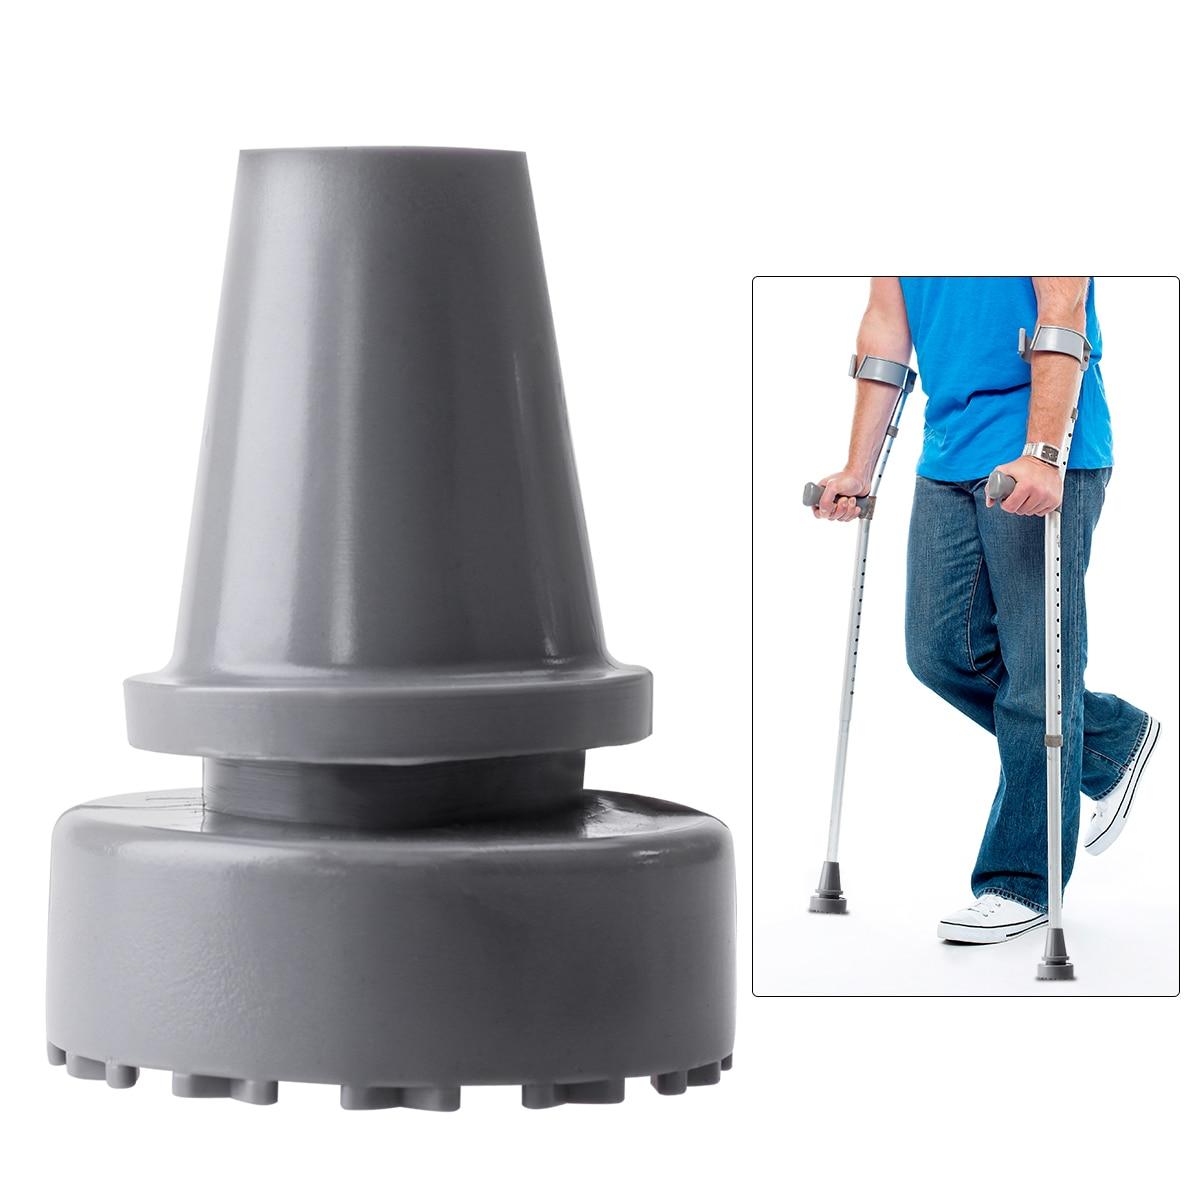 ROSENICE 19mm Inner Diameter Rubber Head Crutch Accessories Antislip Tips Walking Stick Feet (Grey)